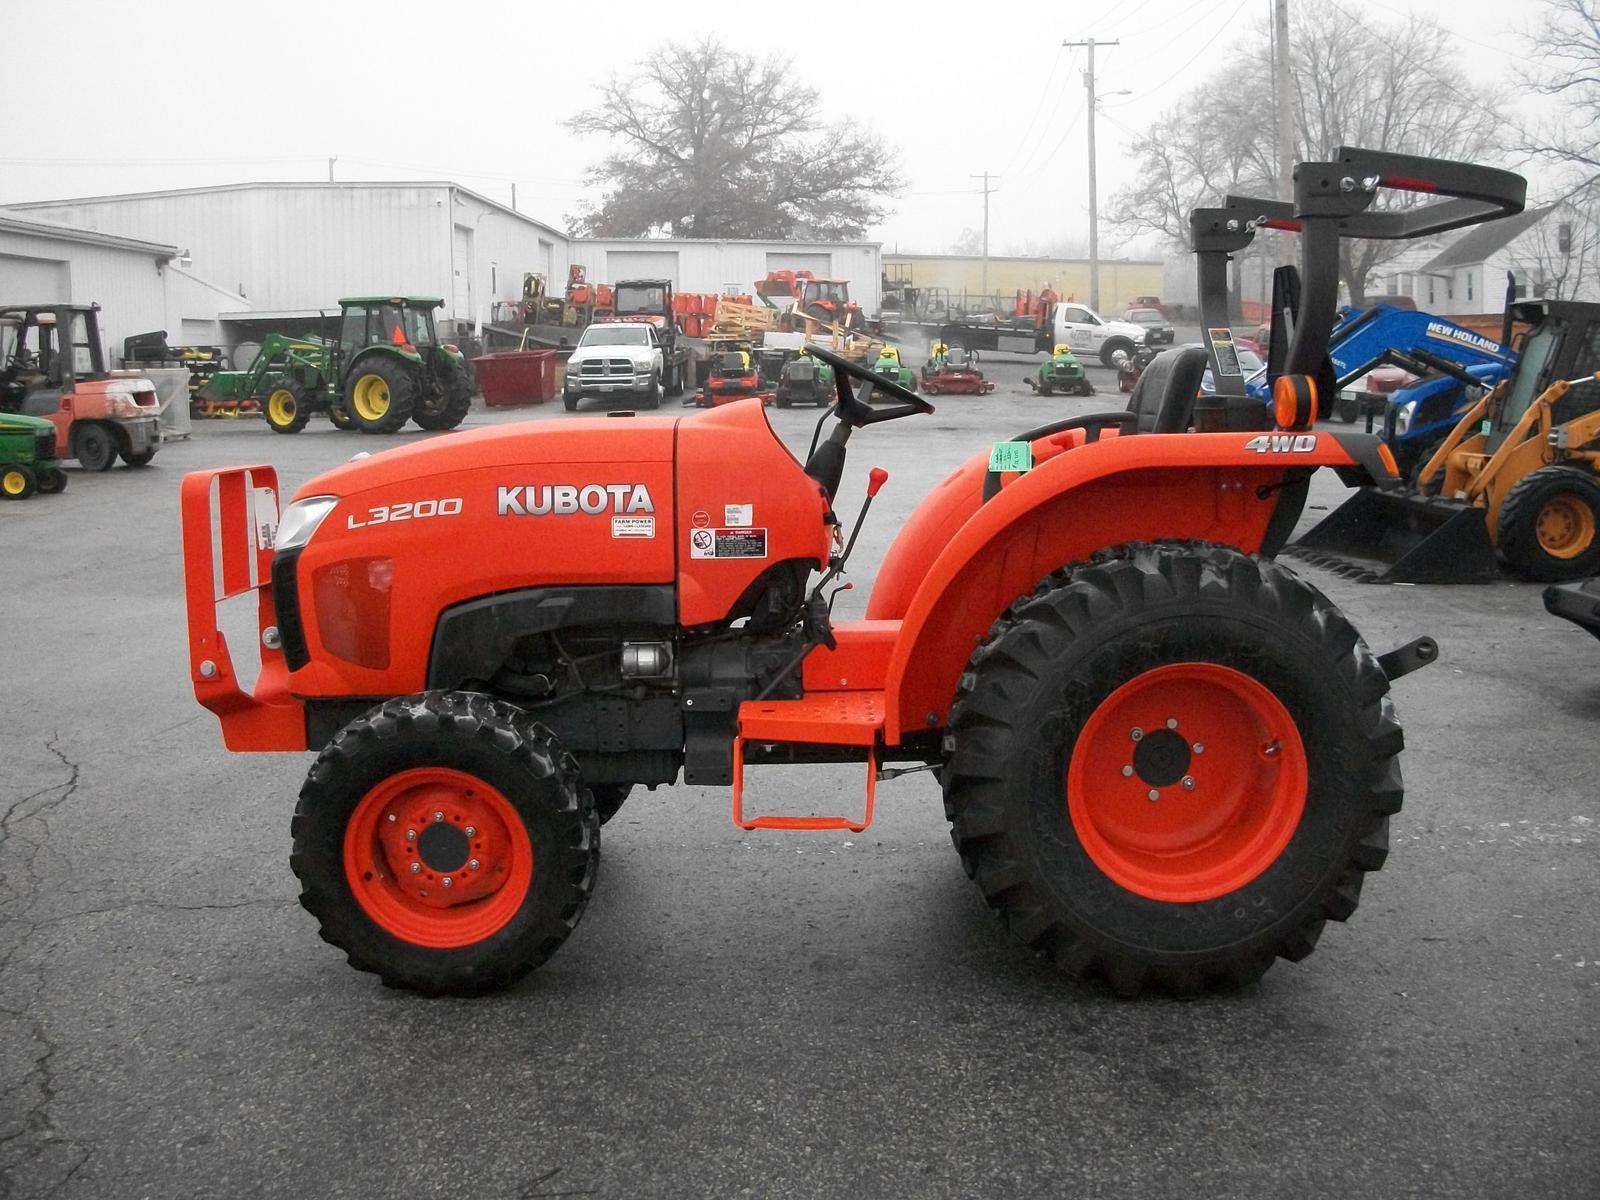 2013 kubota l3200 gear drive 4wd for sale in columbia mo farm rh fplal com Kubota L3200 HST Review Kubota Tractors